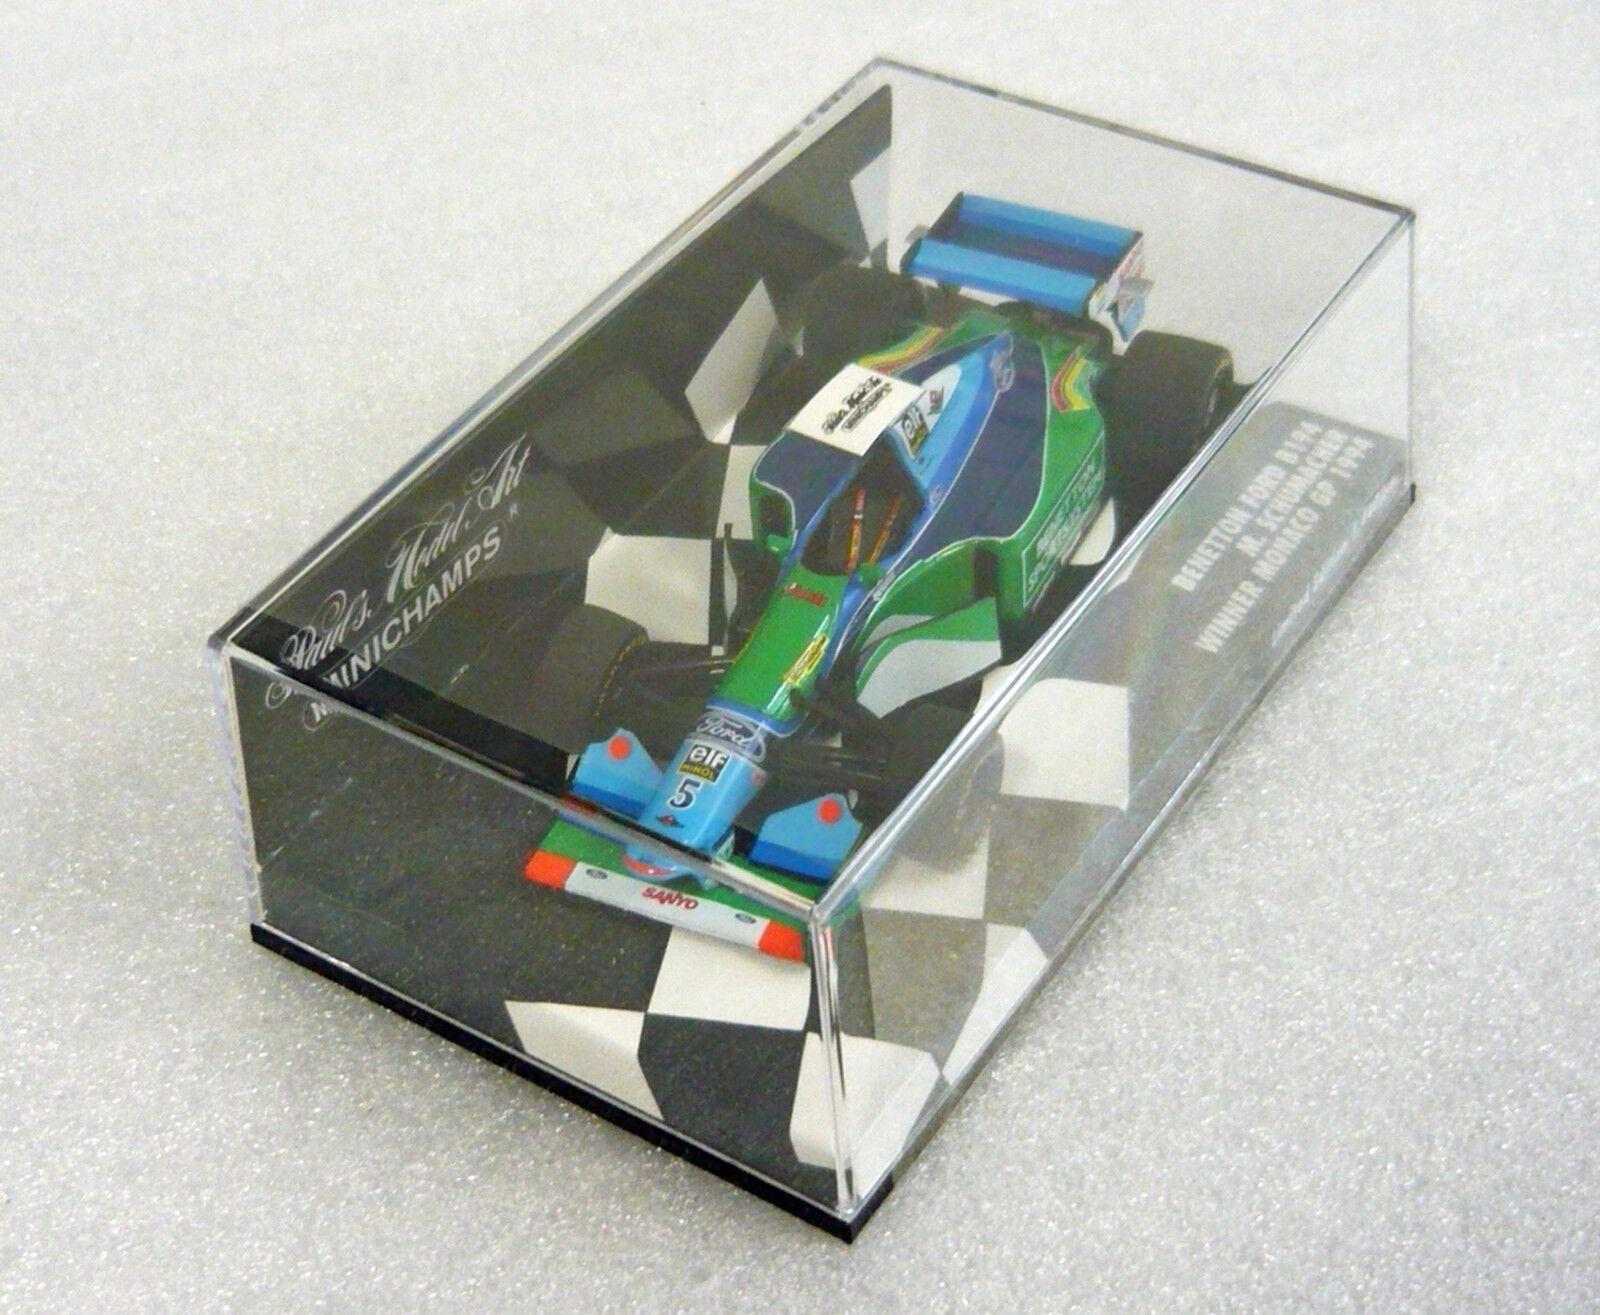 MINICHAMPS 400940035, BENETTON FORD b194, Winner Monaco gp`94 Schumacher, 1/43 NEUF | Outlet